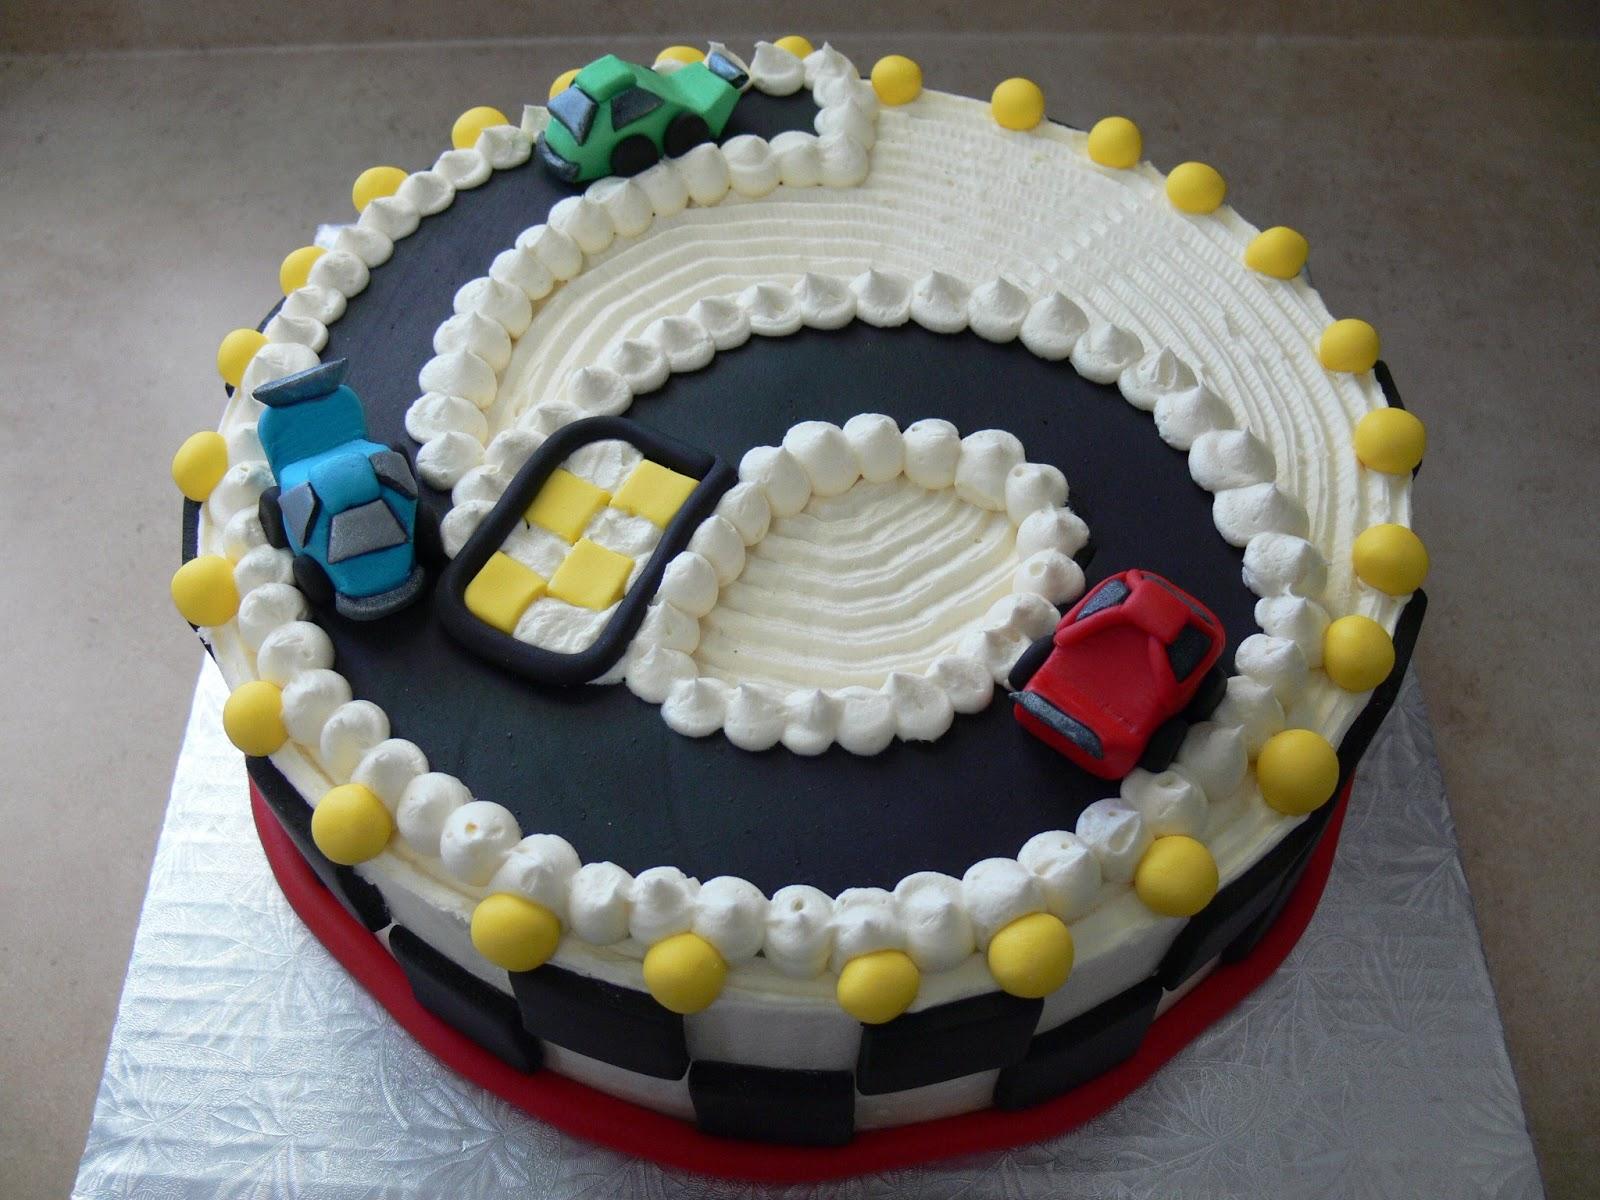 Fondant Cake Design Rosemount : The Ultimate Chocolate Blog: Chocolate Cake that Looks ...